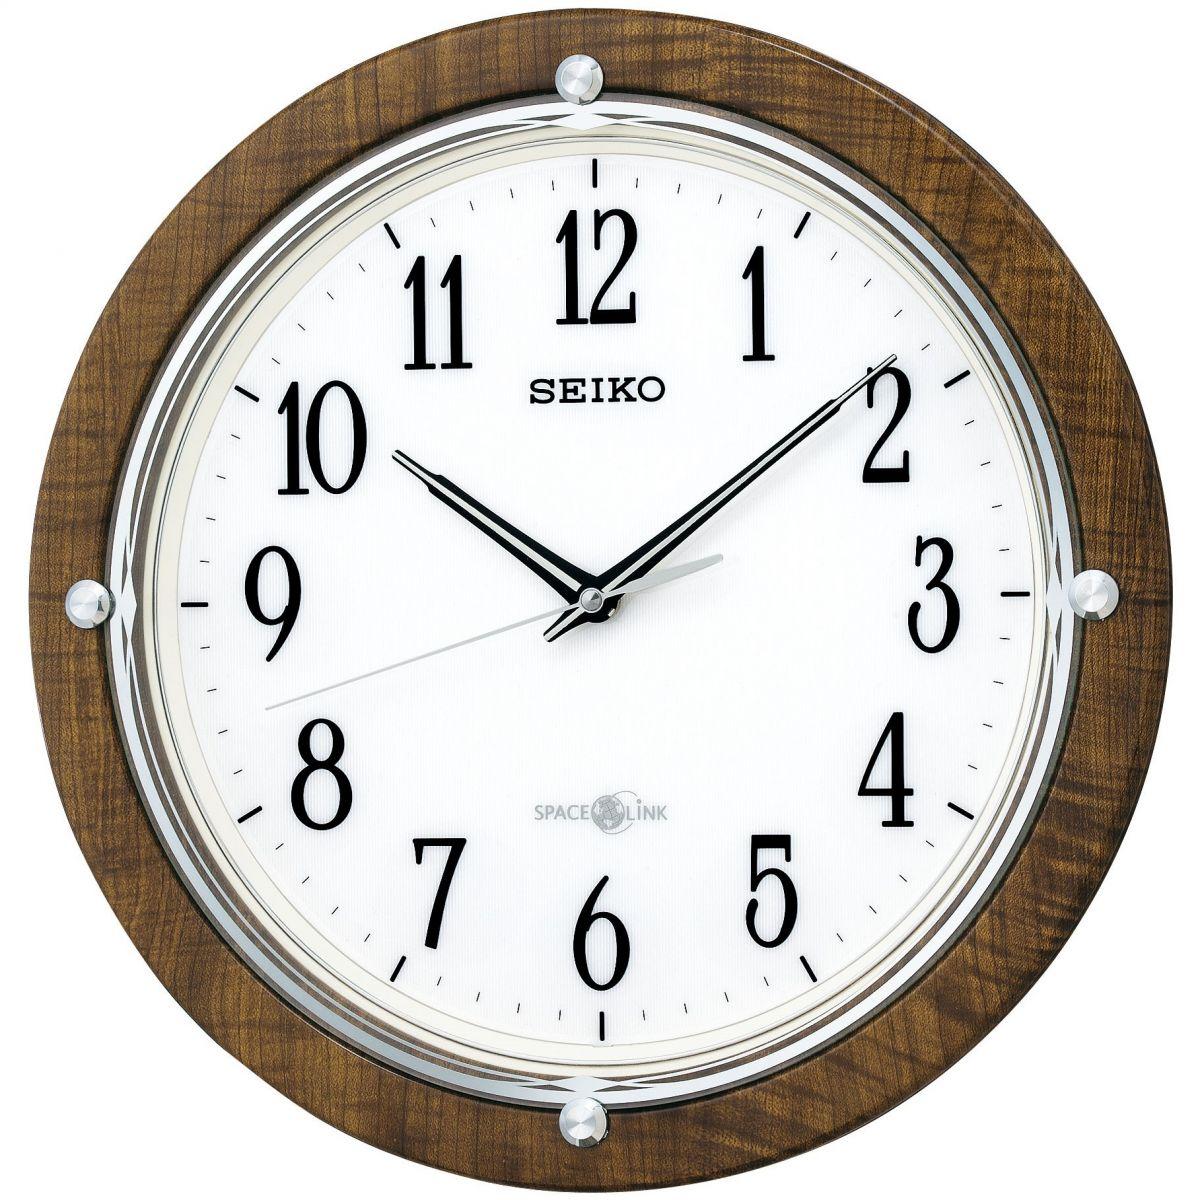 Clock Seiko Clocks Space Link Wall Clock Watch Qxz004b